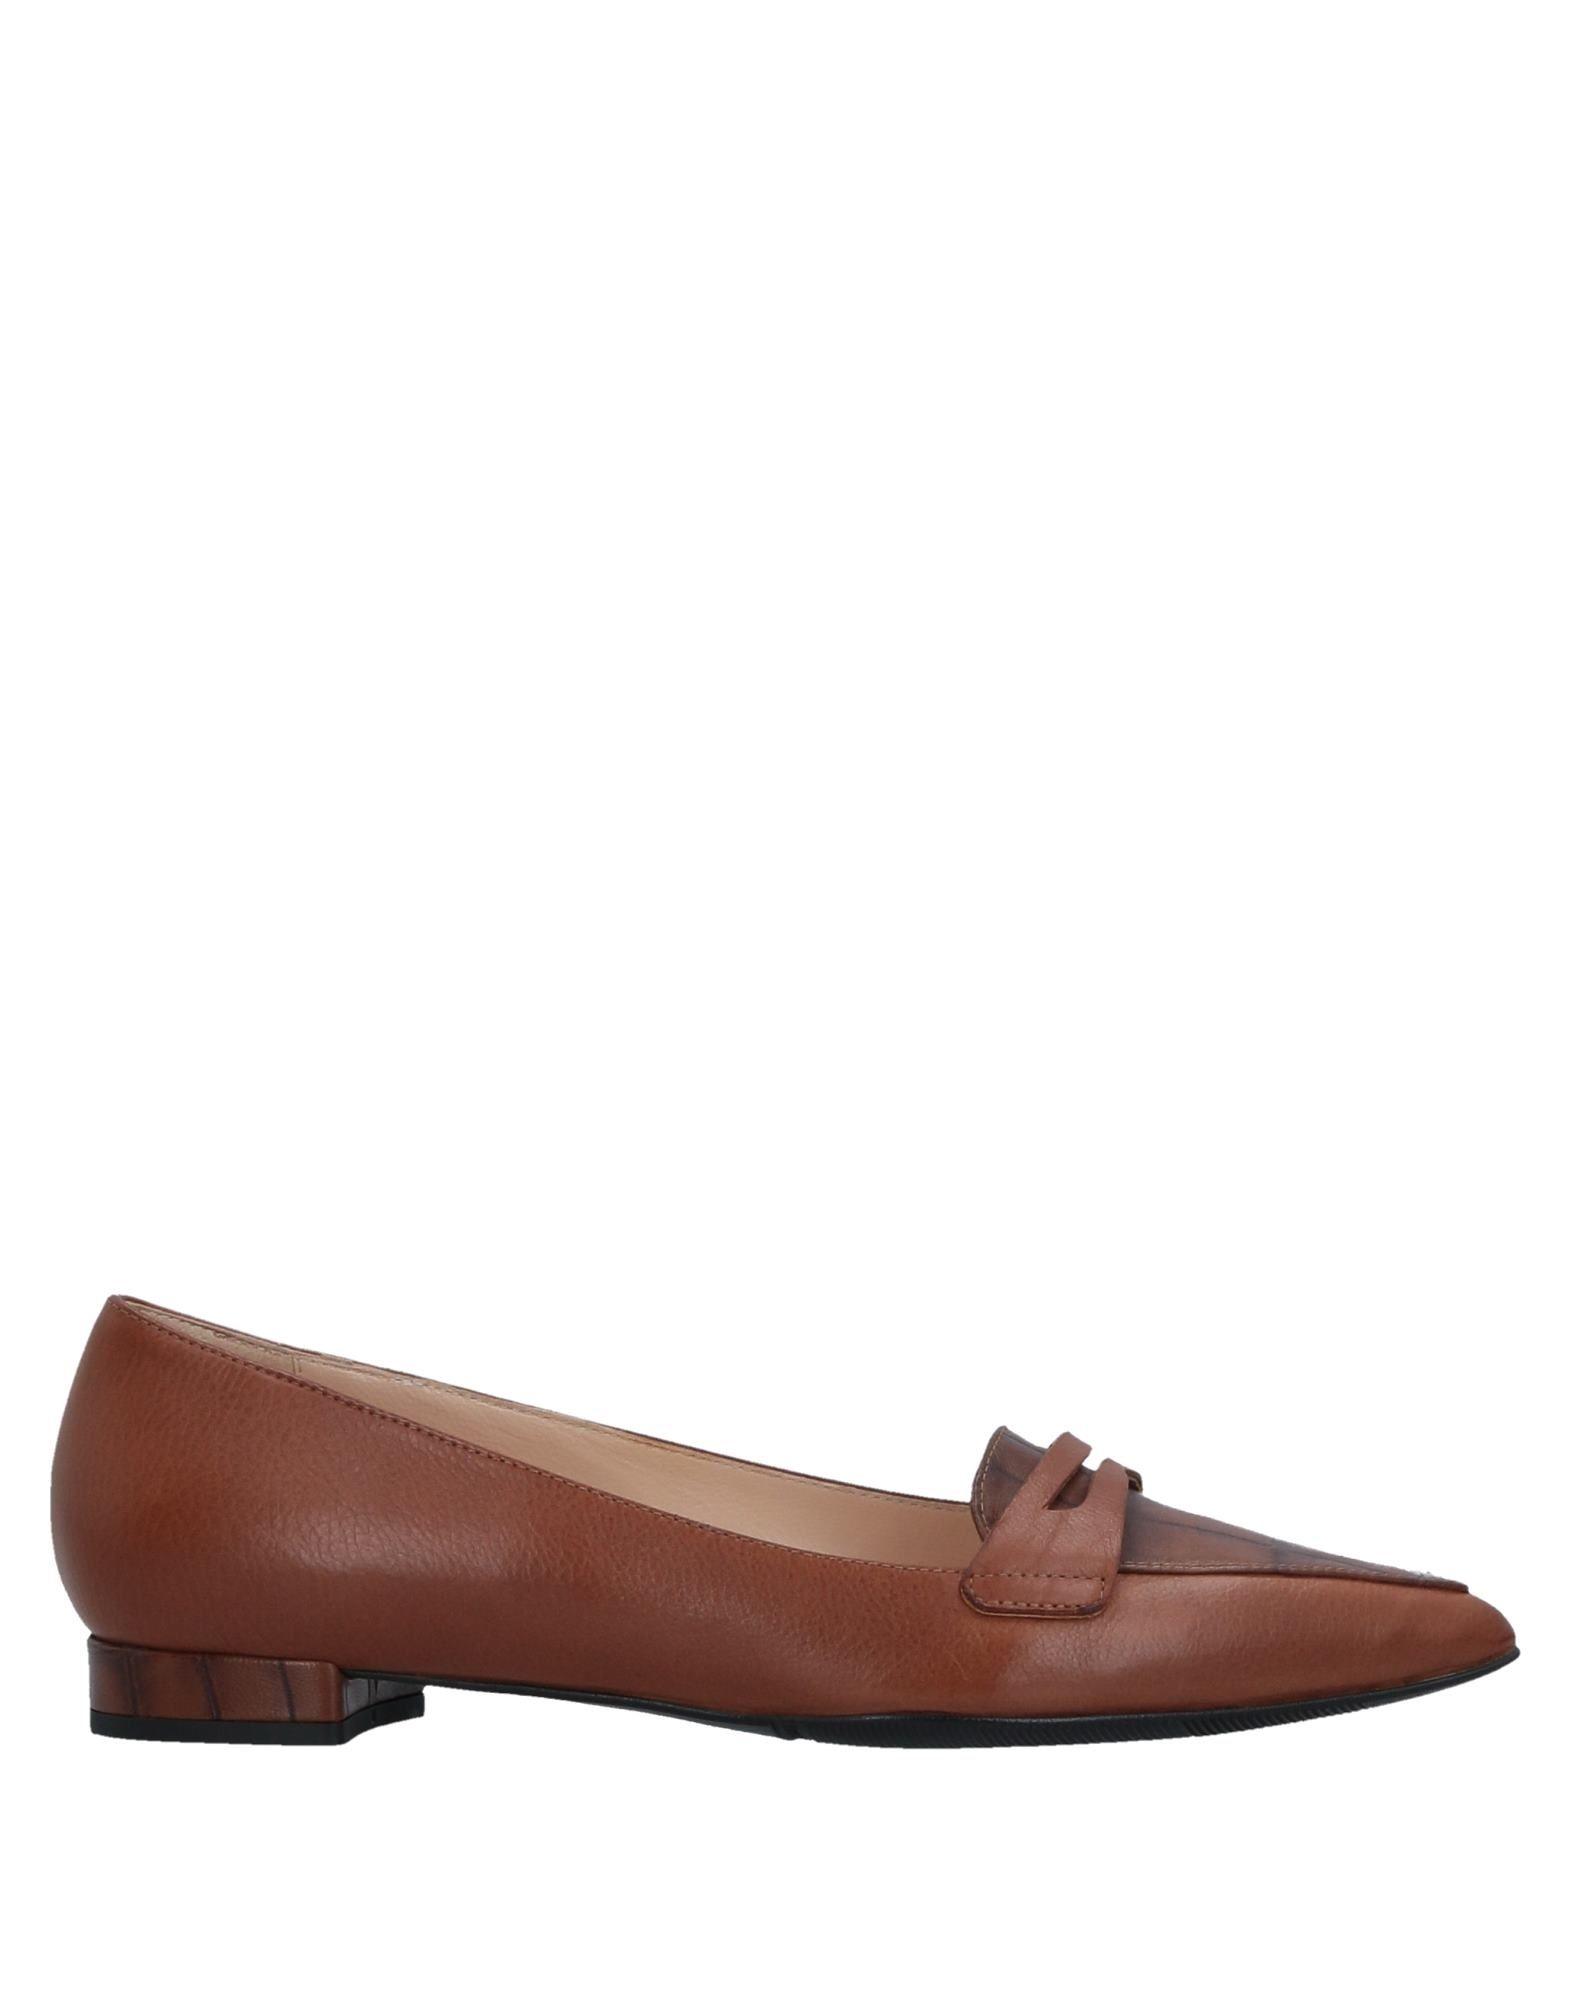 F.Lli Bruglia Mokassins Damen  11520629UI Neue Schuhe